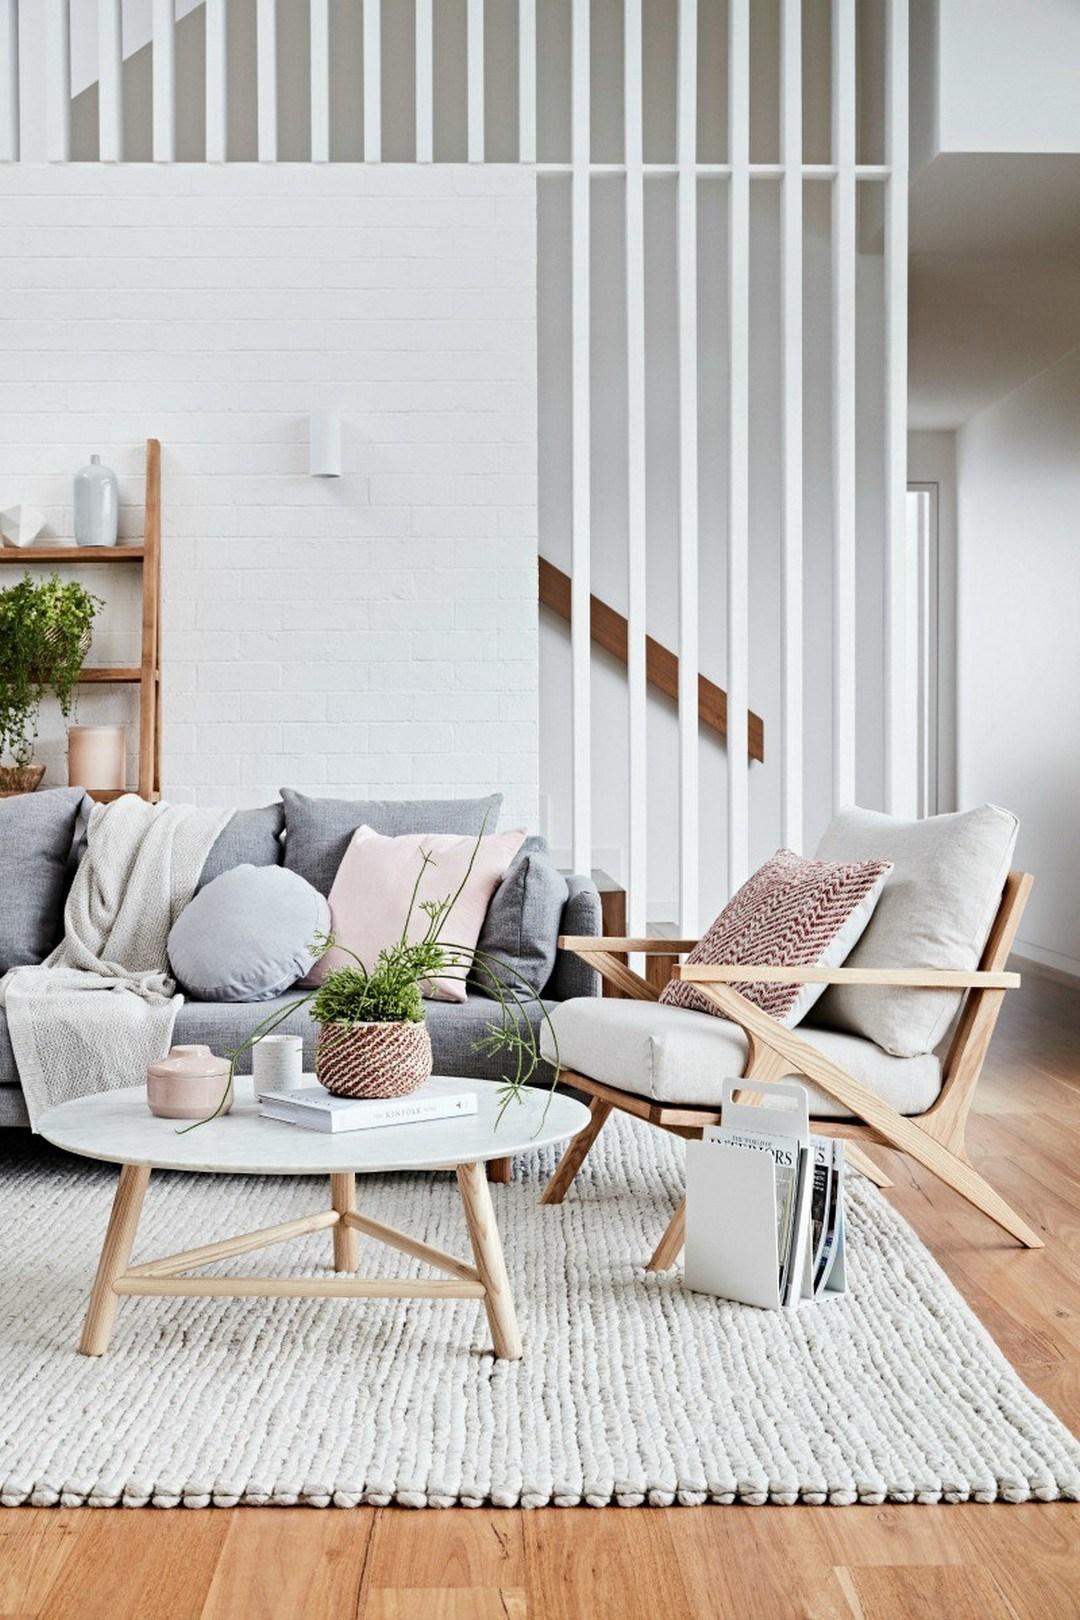 What's Hot On Pinterest: Why Scandinavian & Pastel Decor?